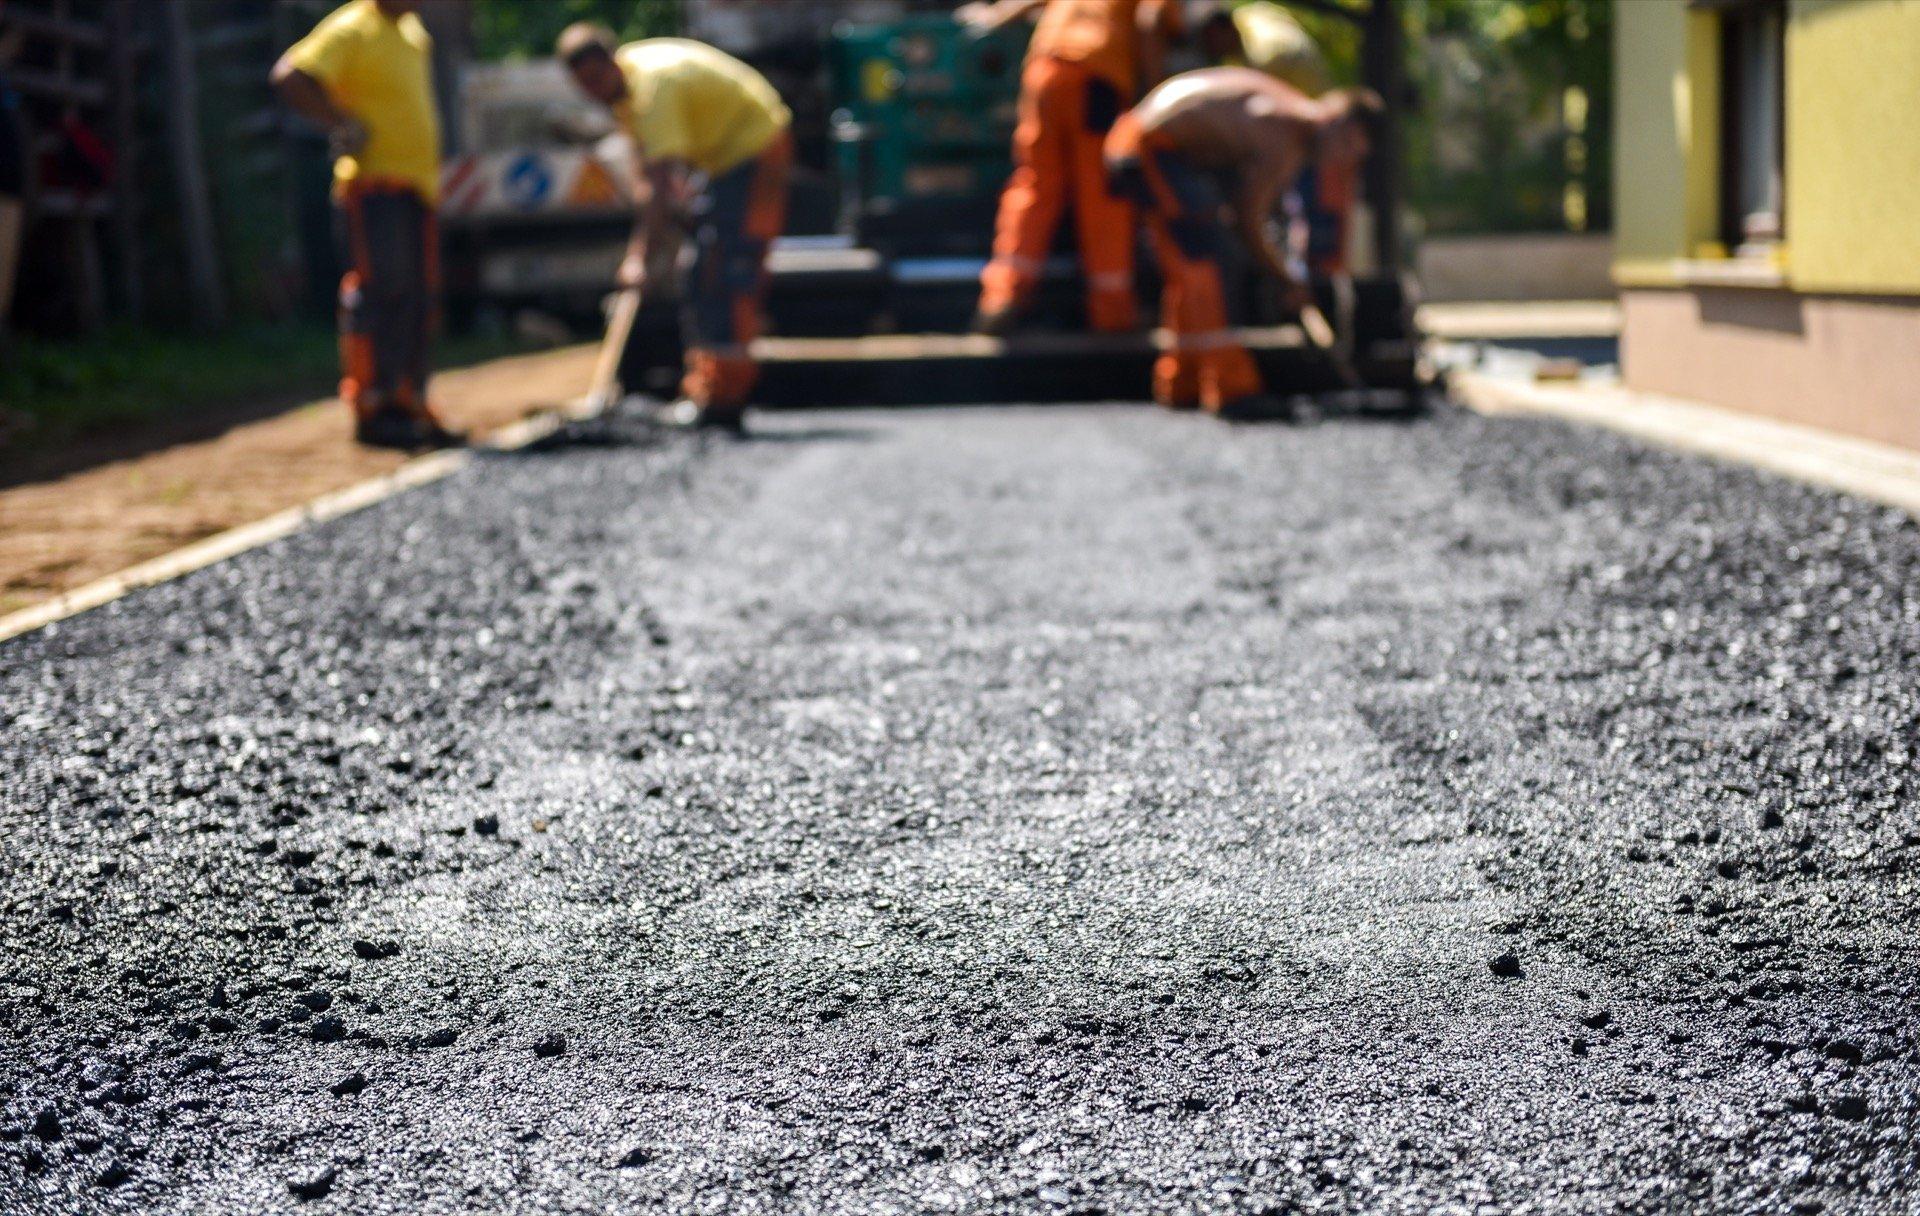 Workers building asphalt driveway